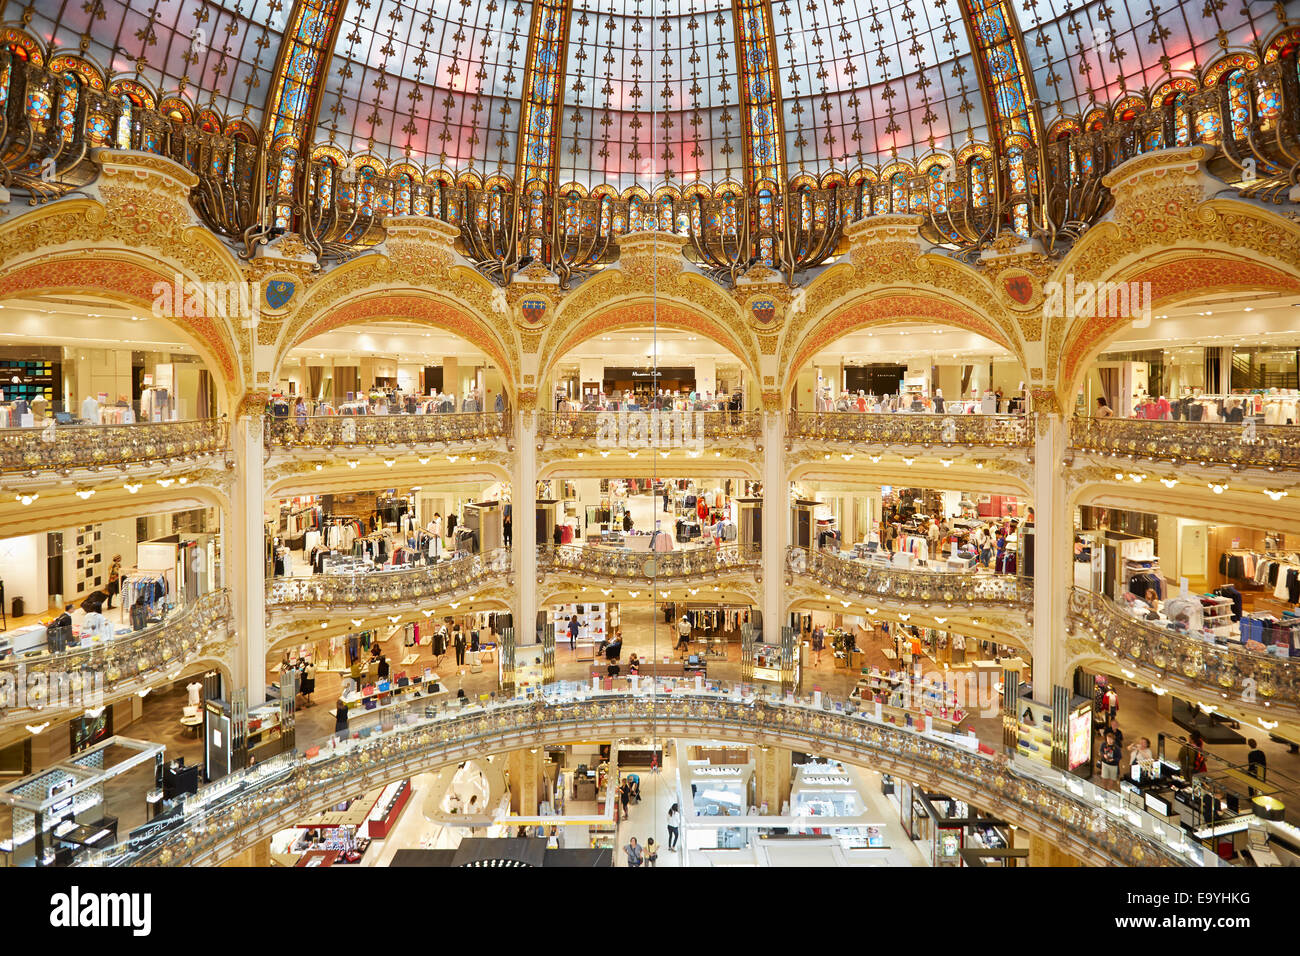 Galeries Lafayette interior in Paris, luxury shopping mall - Stock Image